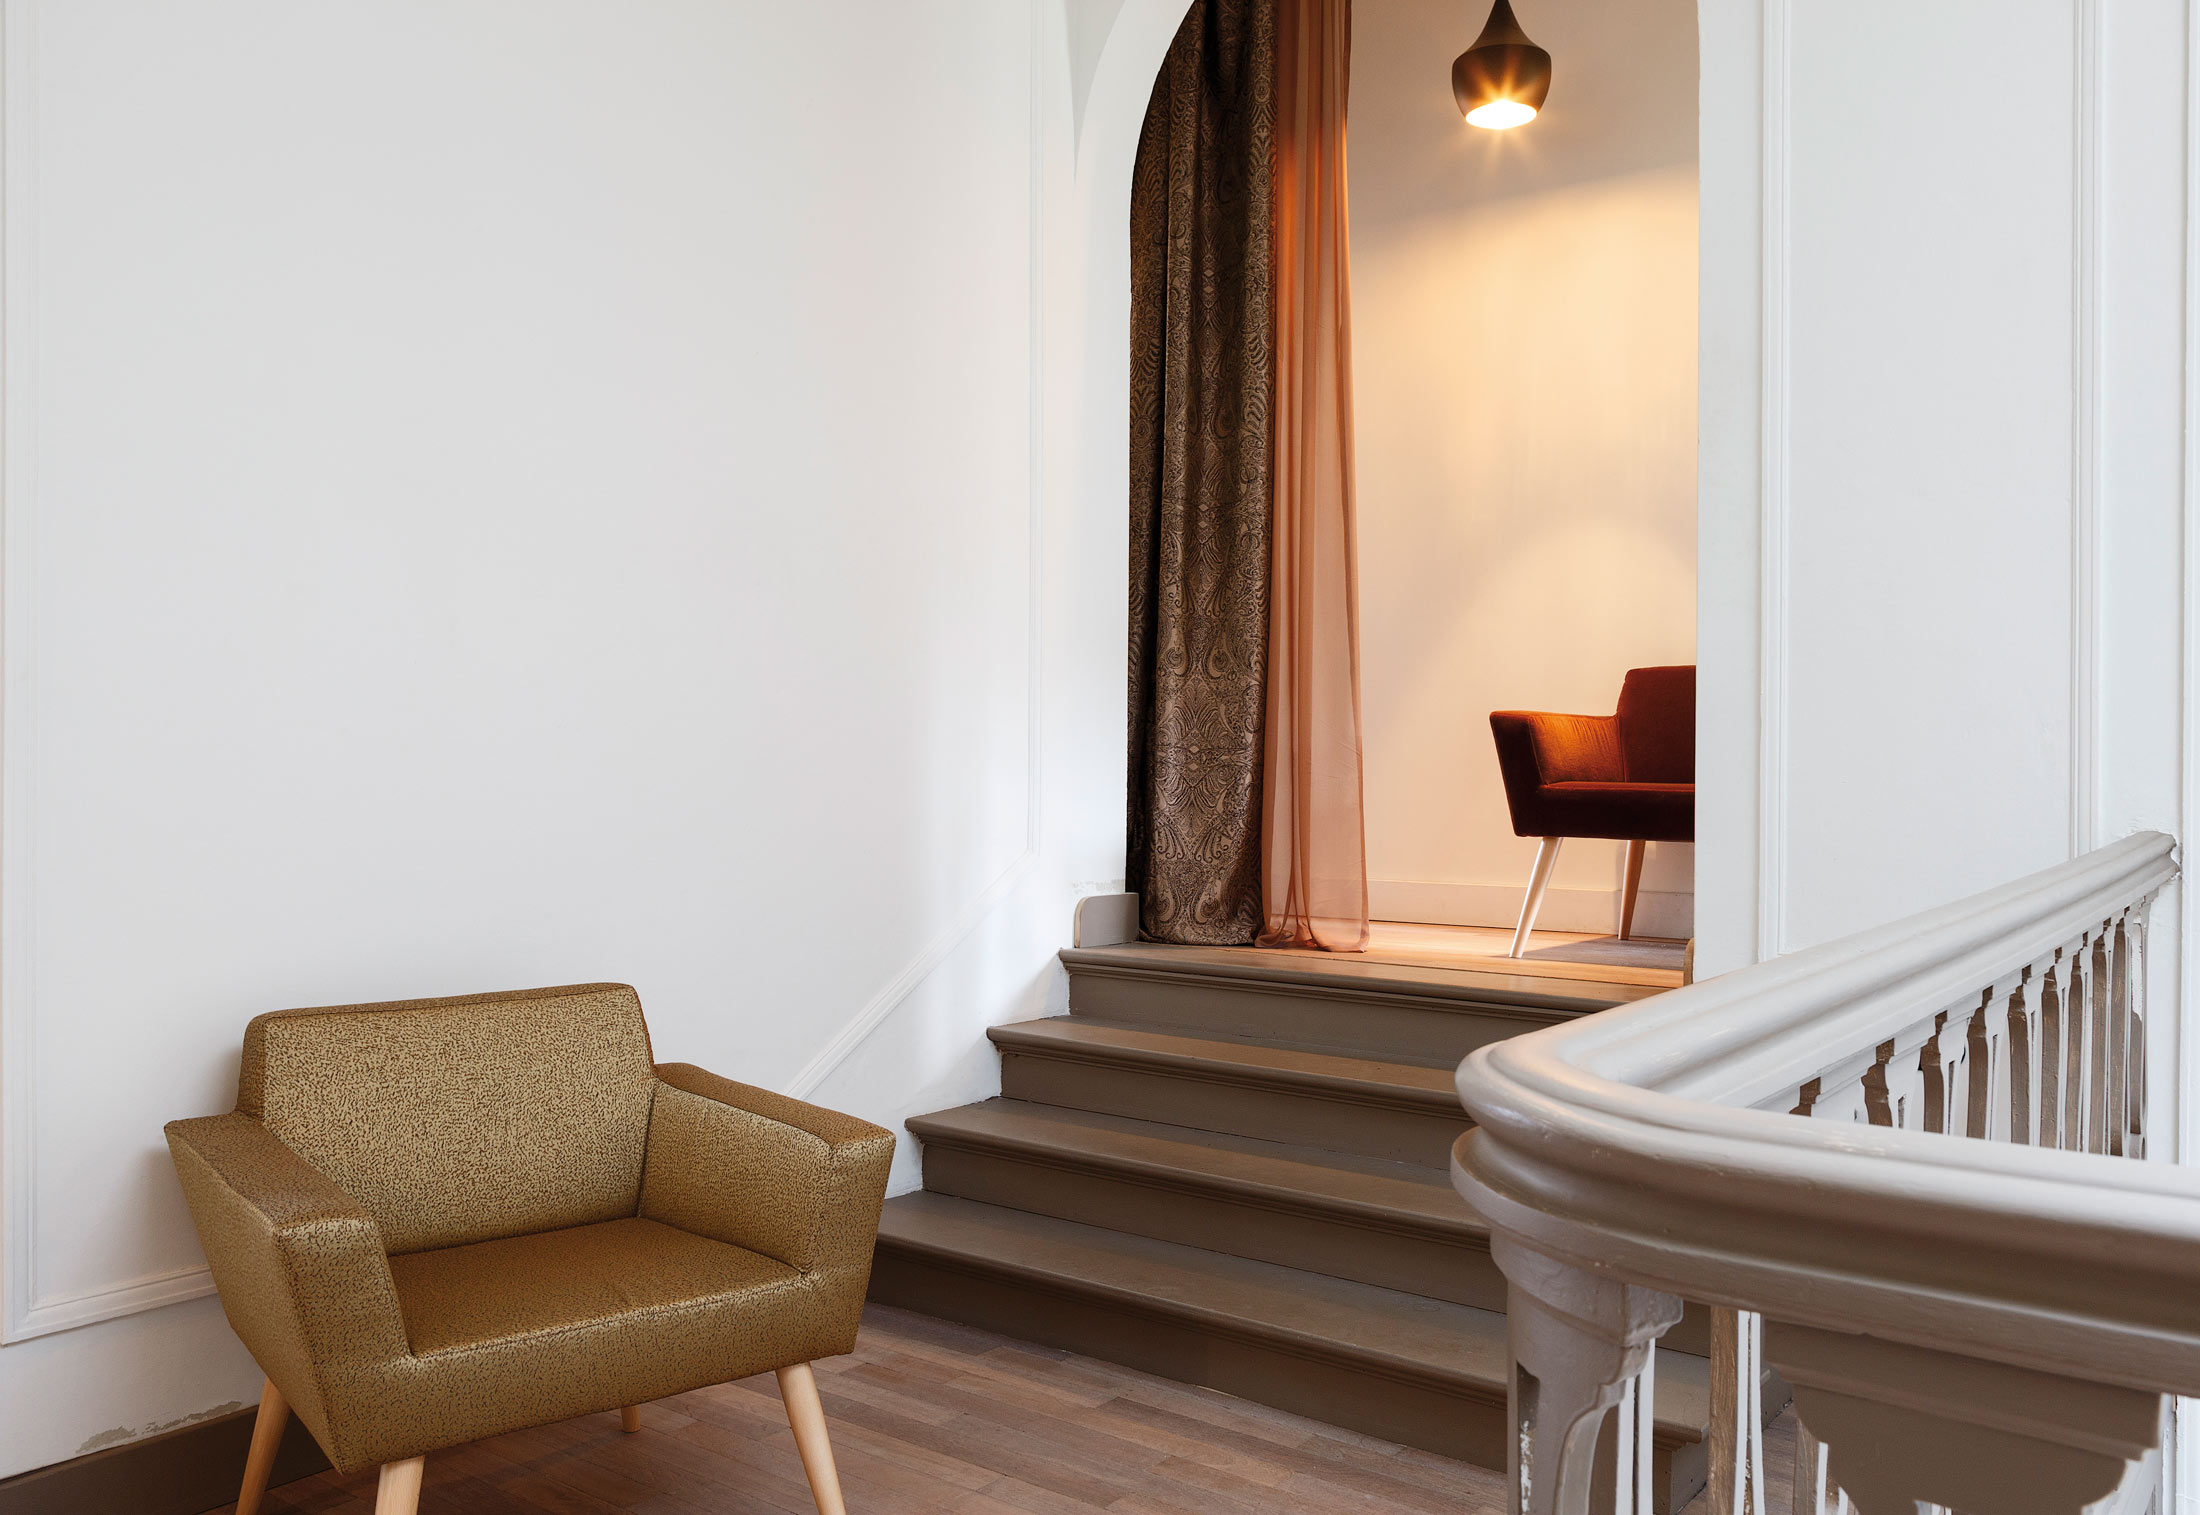 persian nights von christian fischbacher stylepark. Black Bedroom Furniture Sets. Home Design Ideas